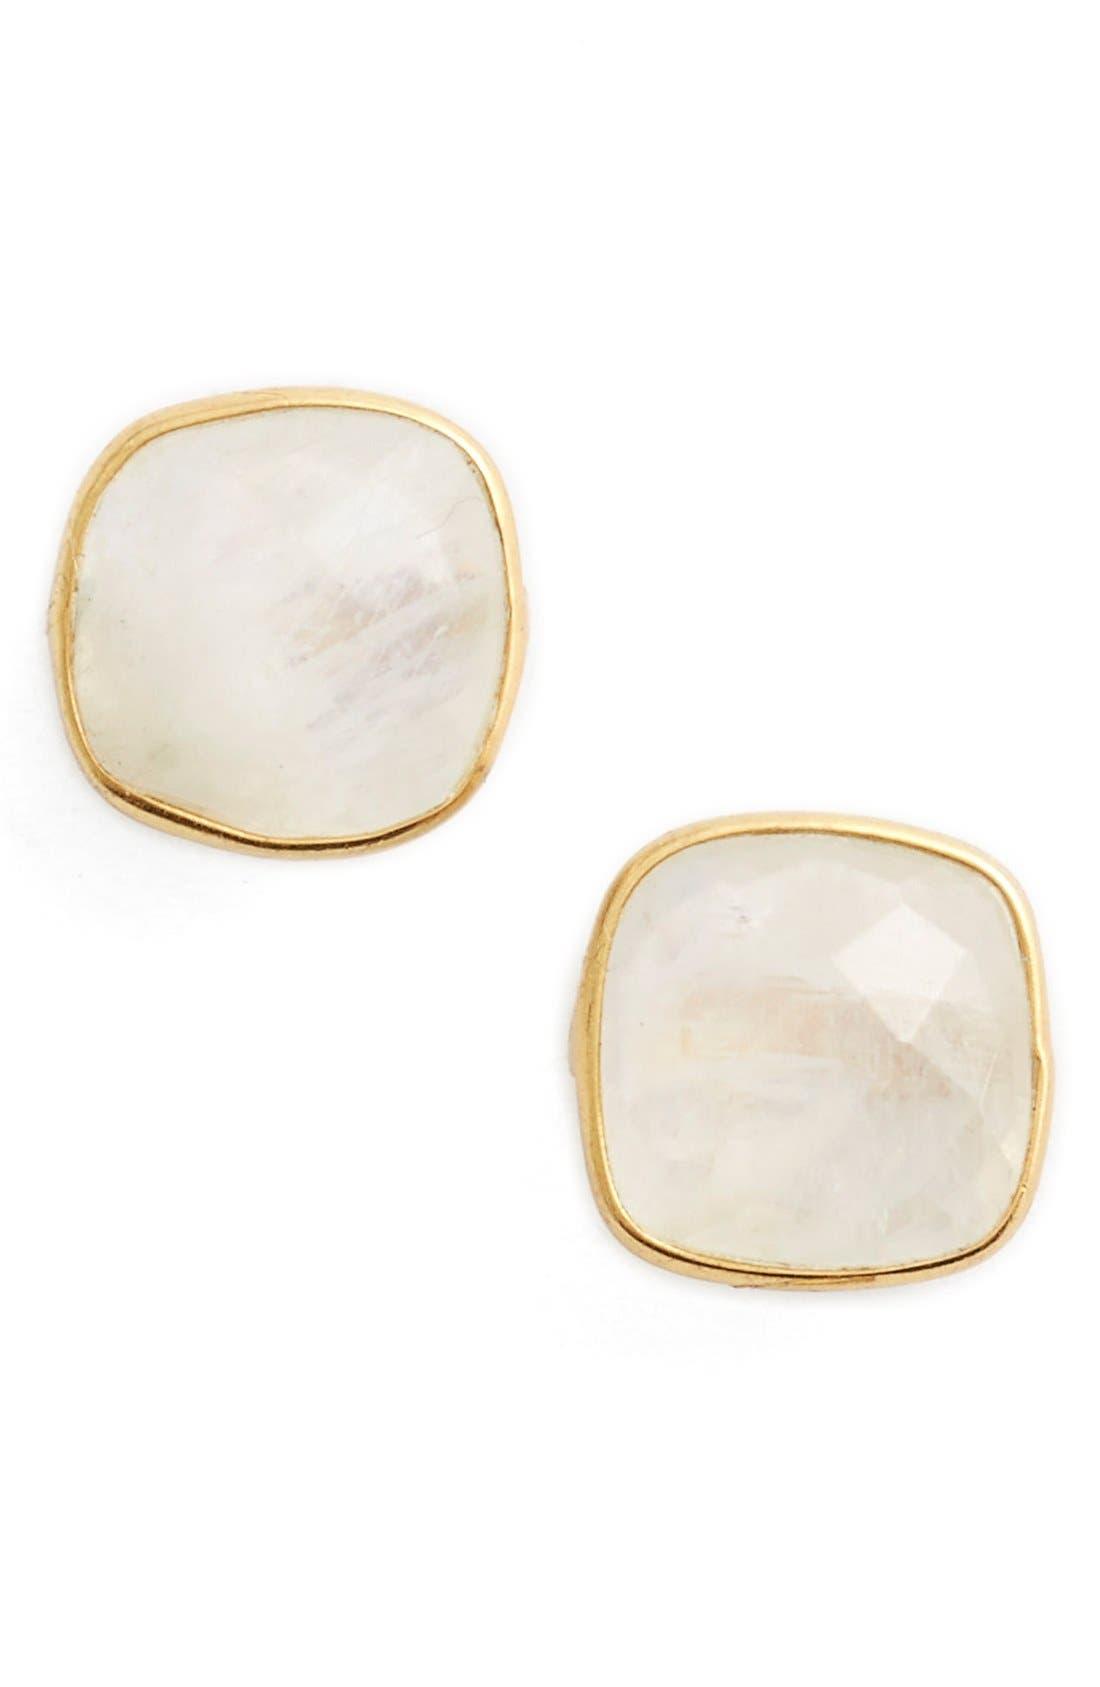 Main Image - Argento Vivo Semiprecious Stone Stud Earrings